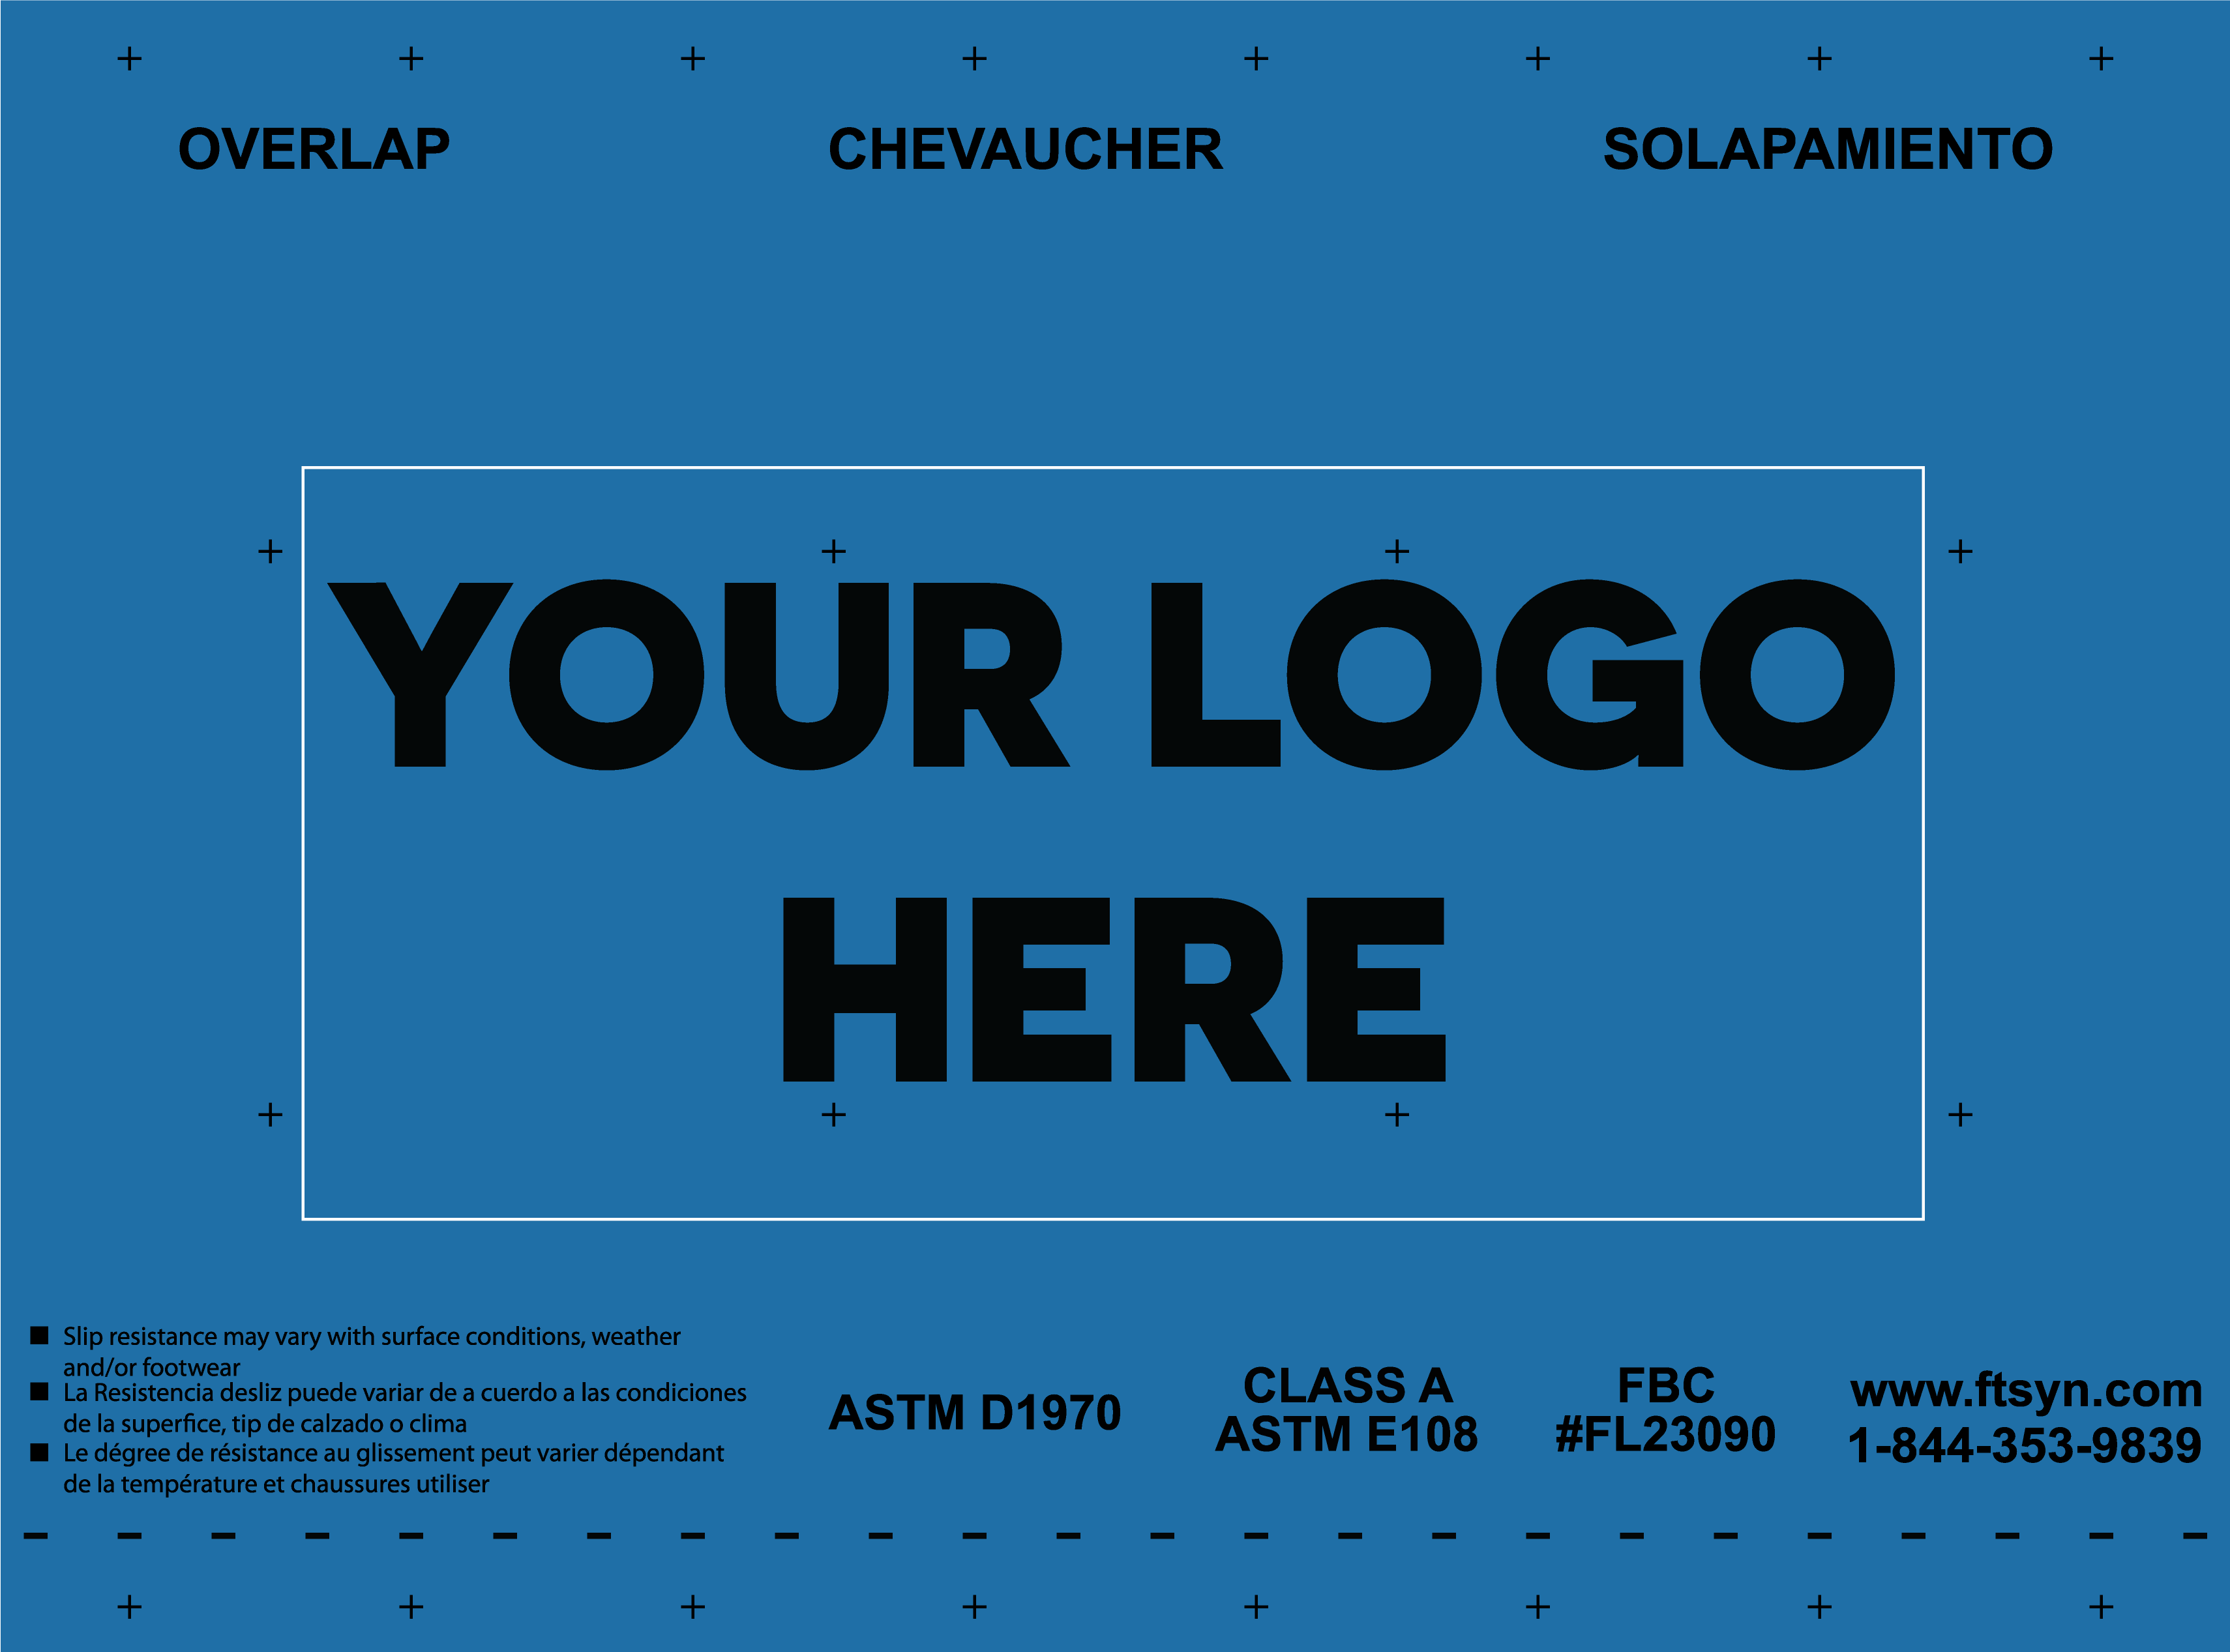 FT-platimum-htsa-your-logo-here